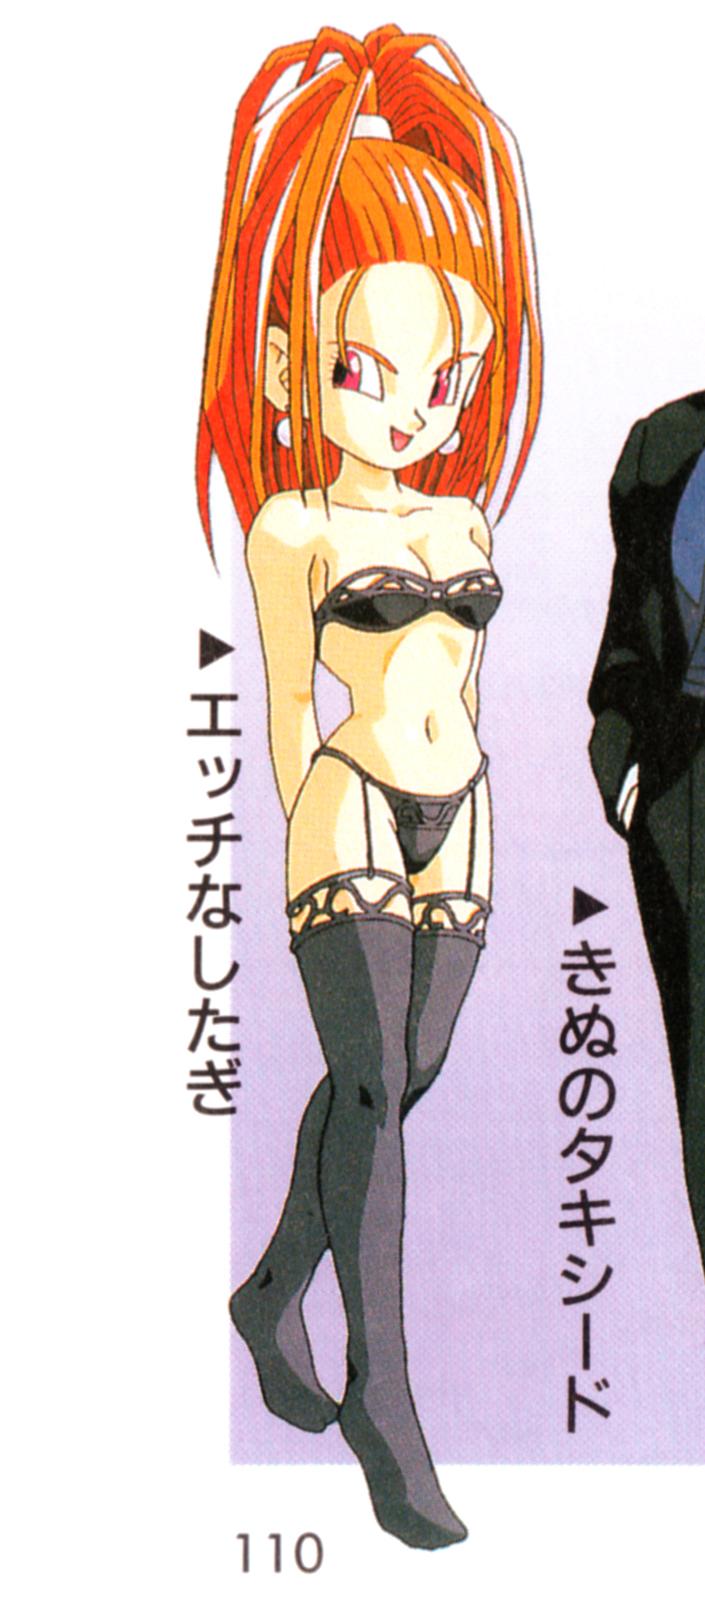 Dragon_Quest6_Barbara1_Sexy_Lingerie.jpg